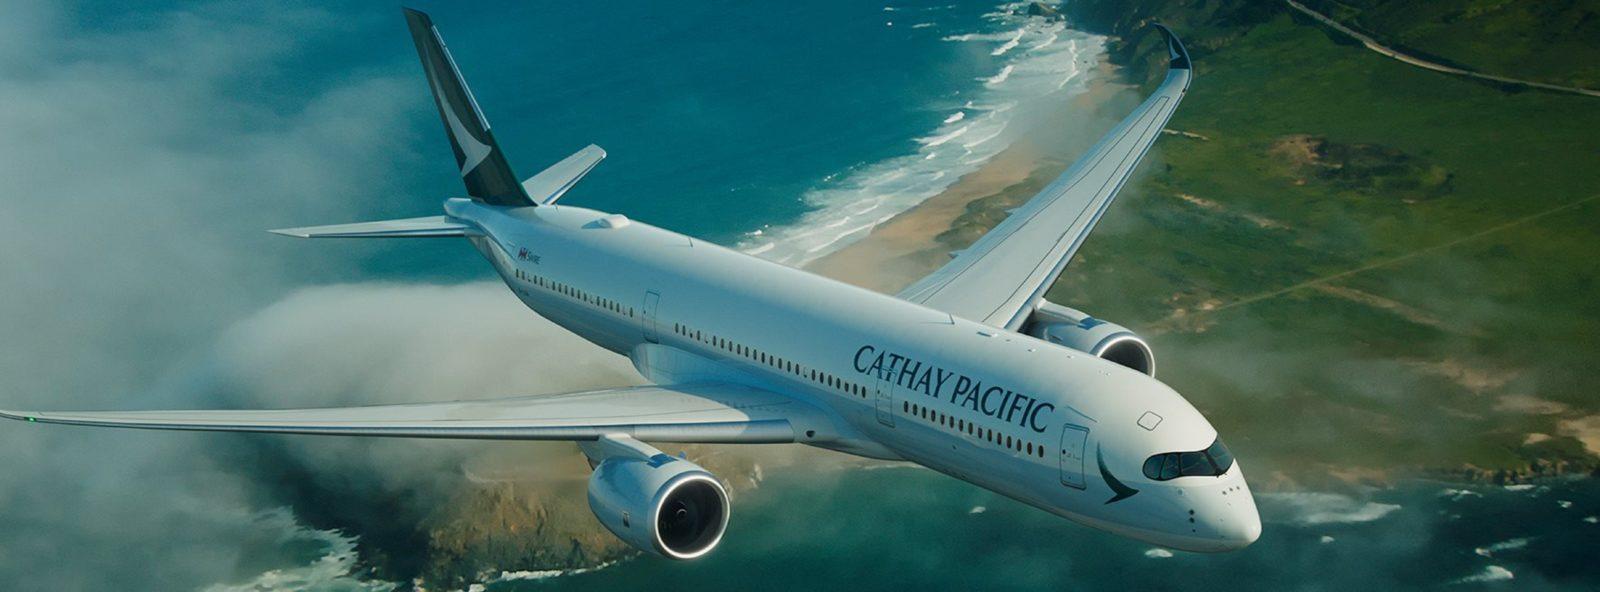 Cathay Pacific, Perth, Western Australia